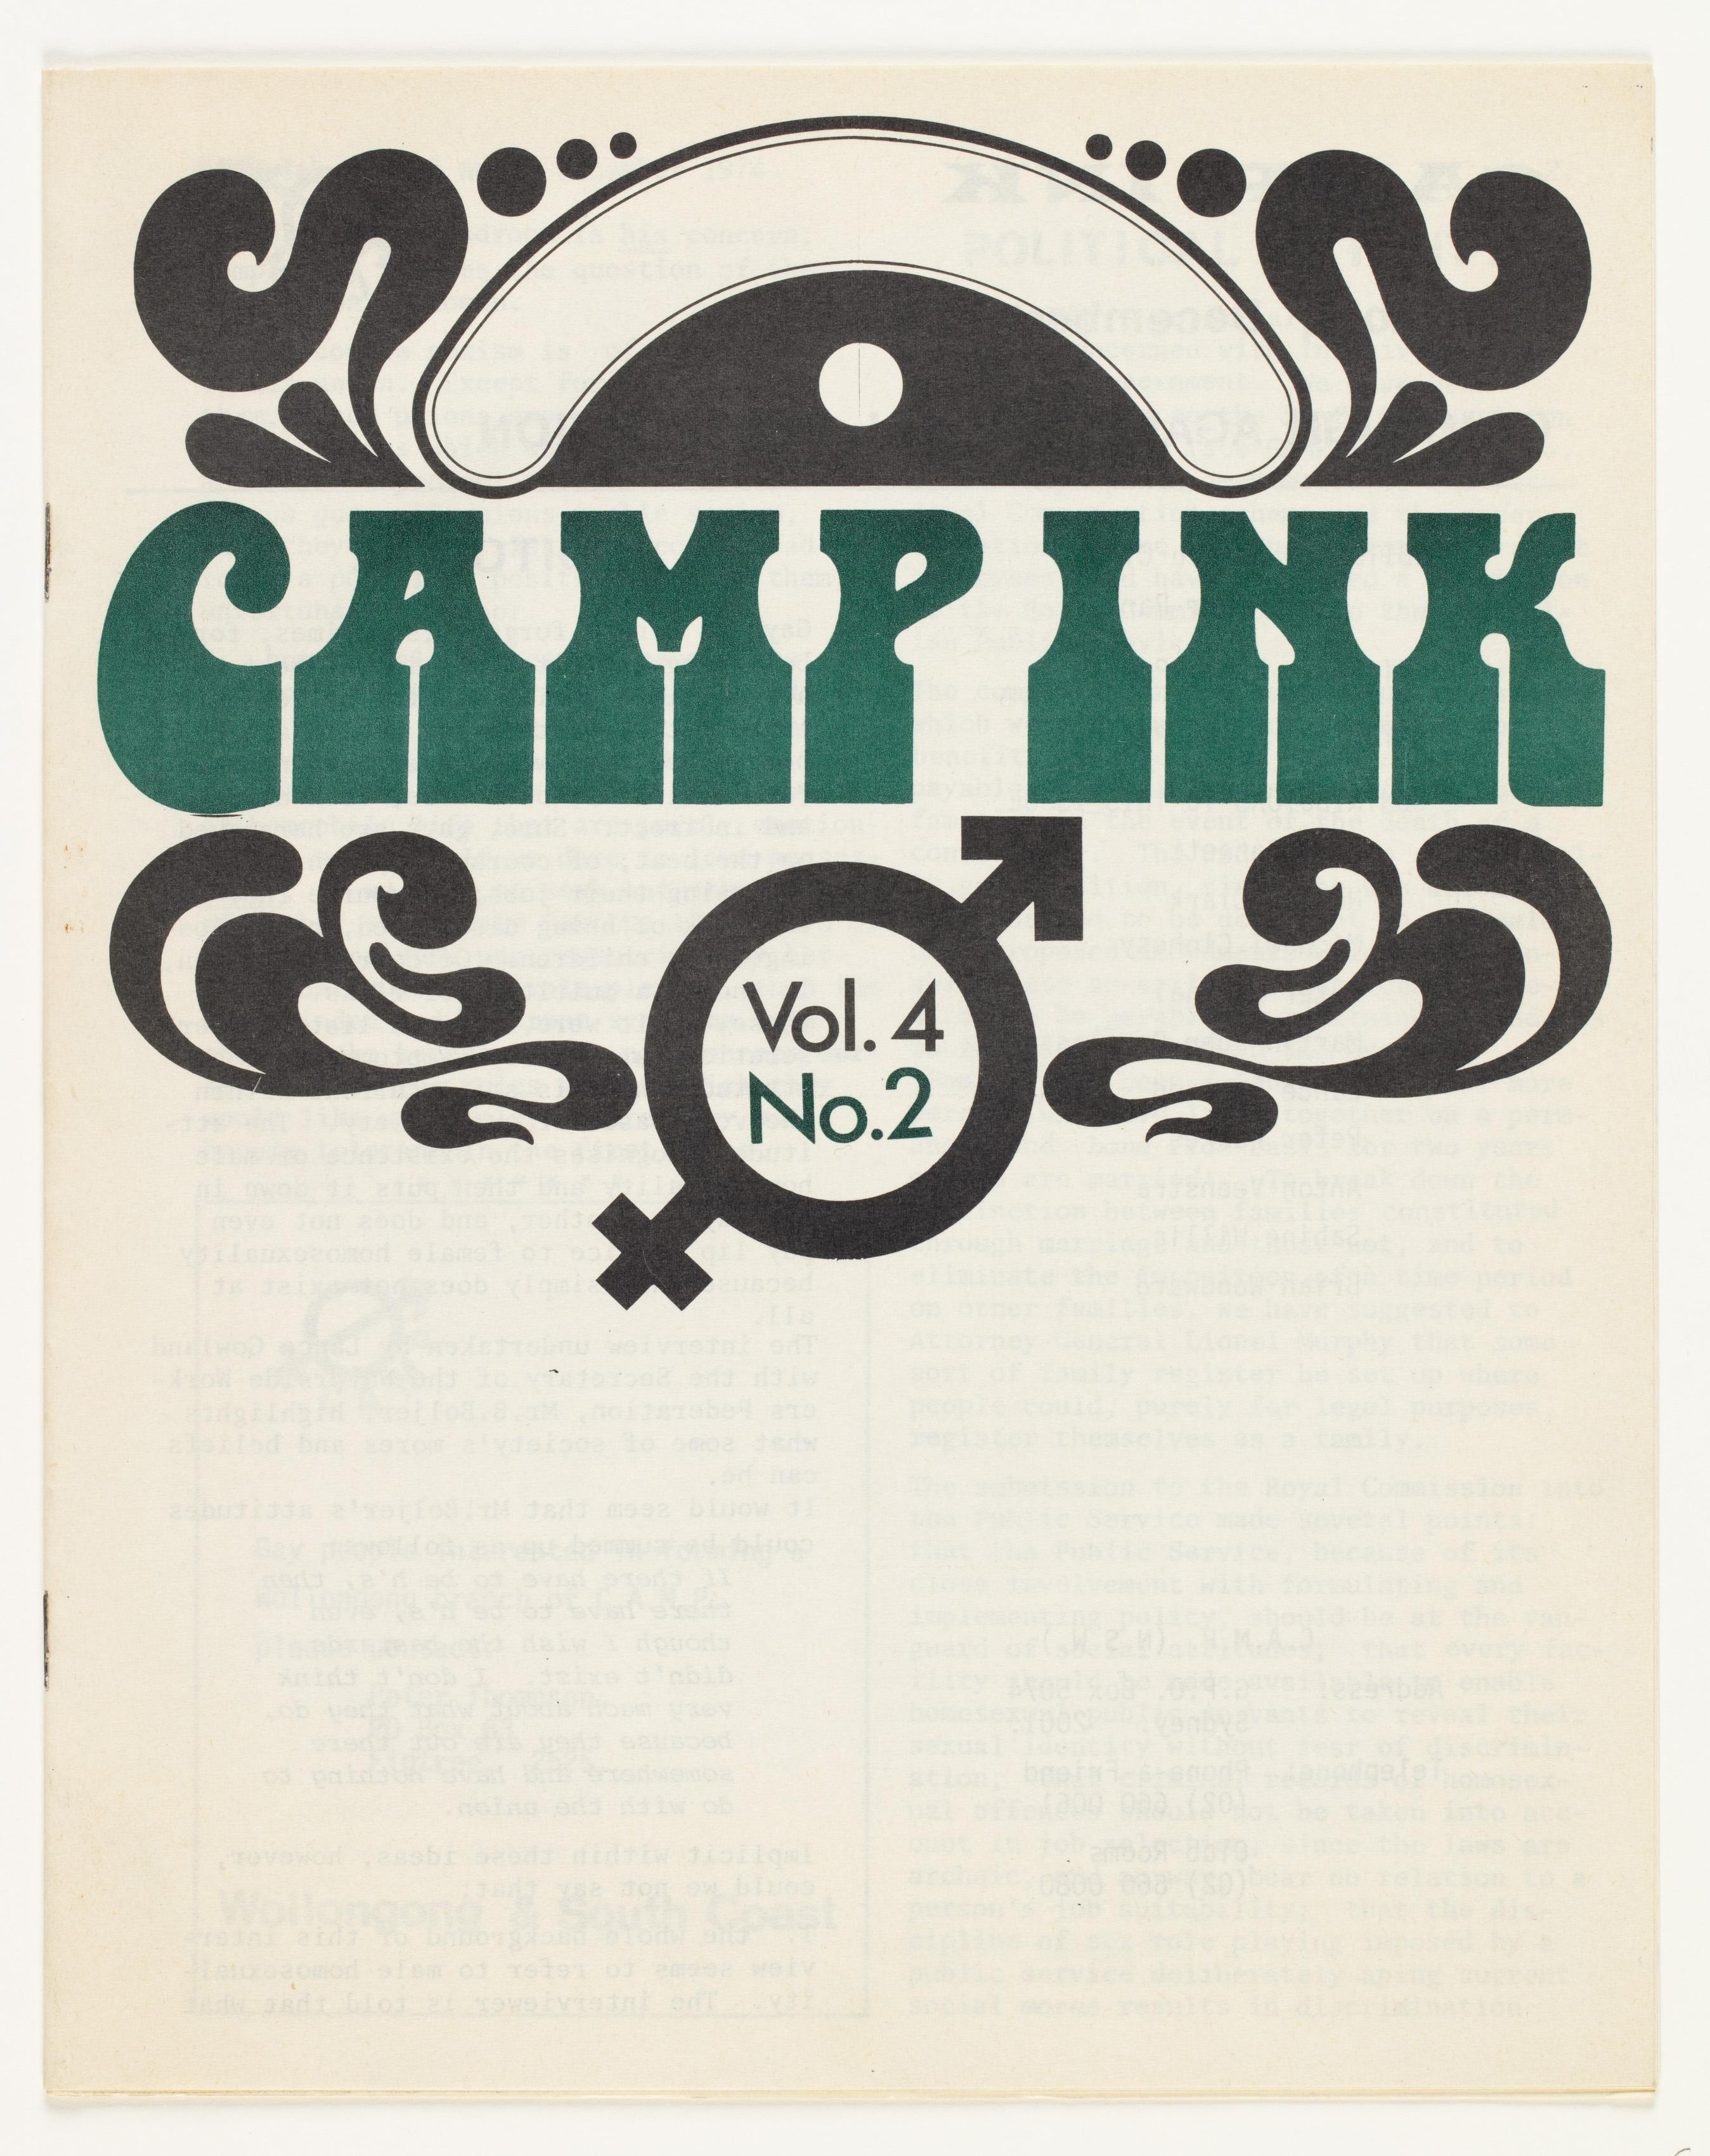 Camp Ink. Vol. 4, No.2 (December 1974)